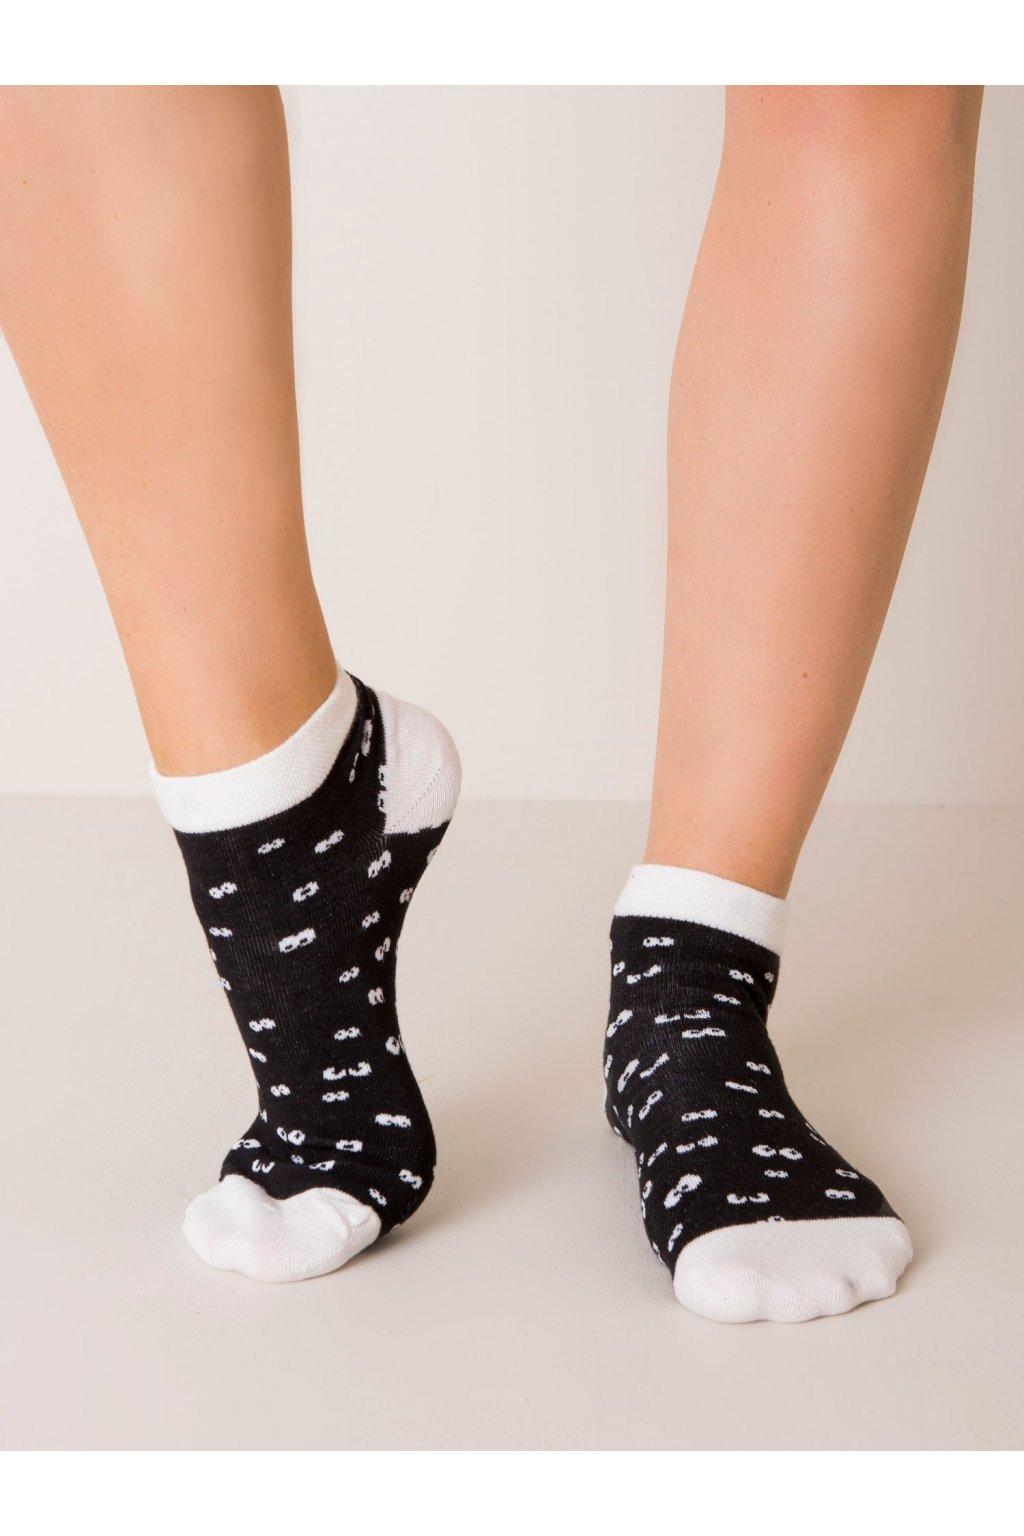 Dámske ponožky kód WS-SR-5743